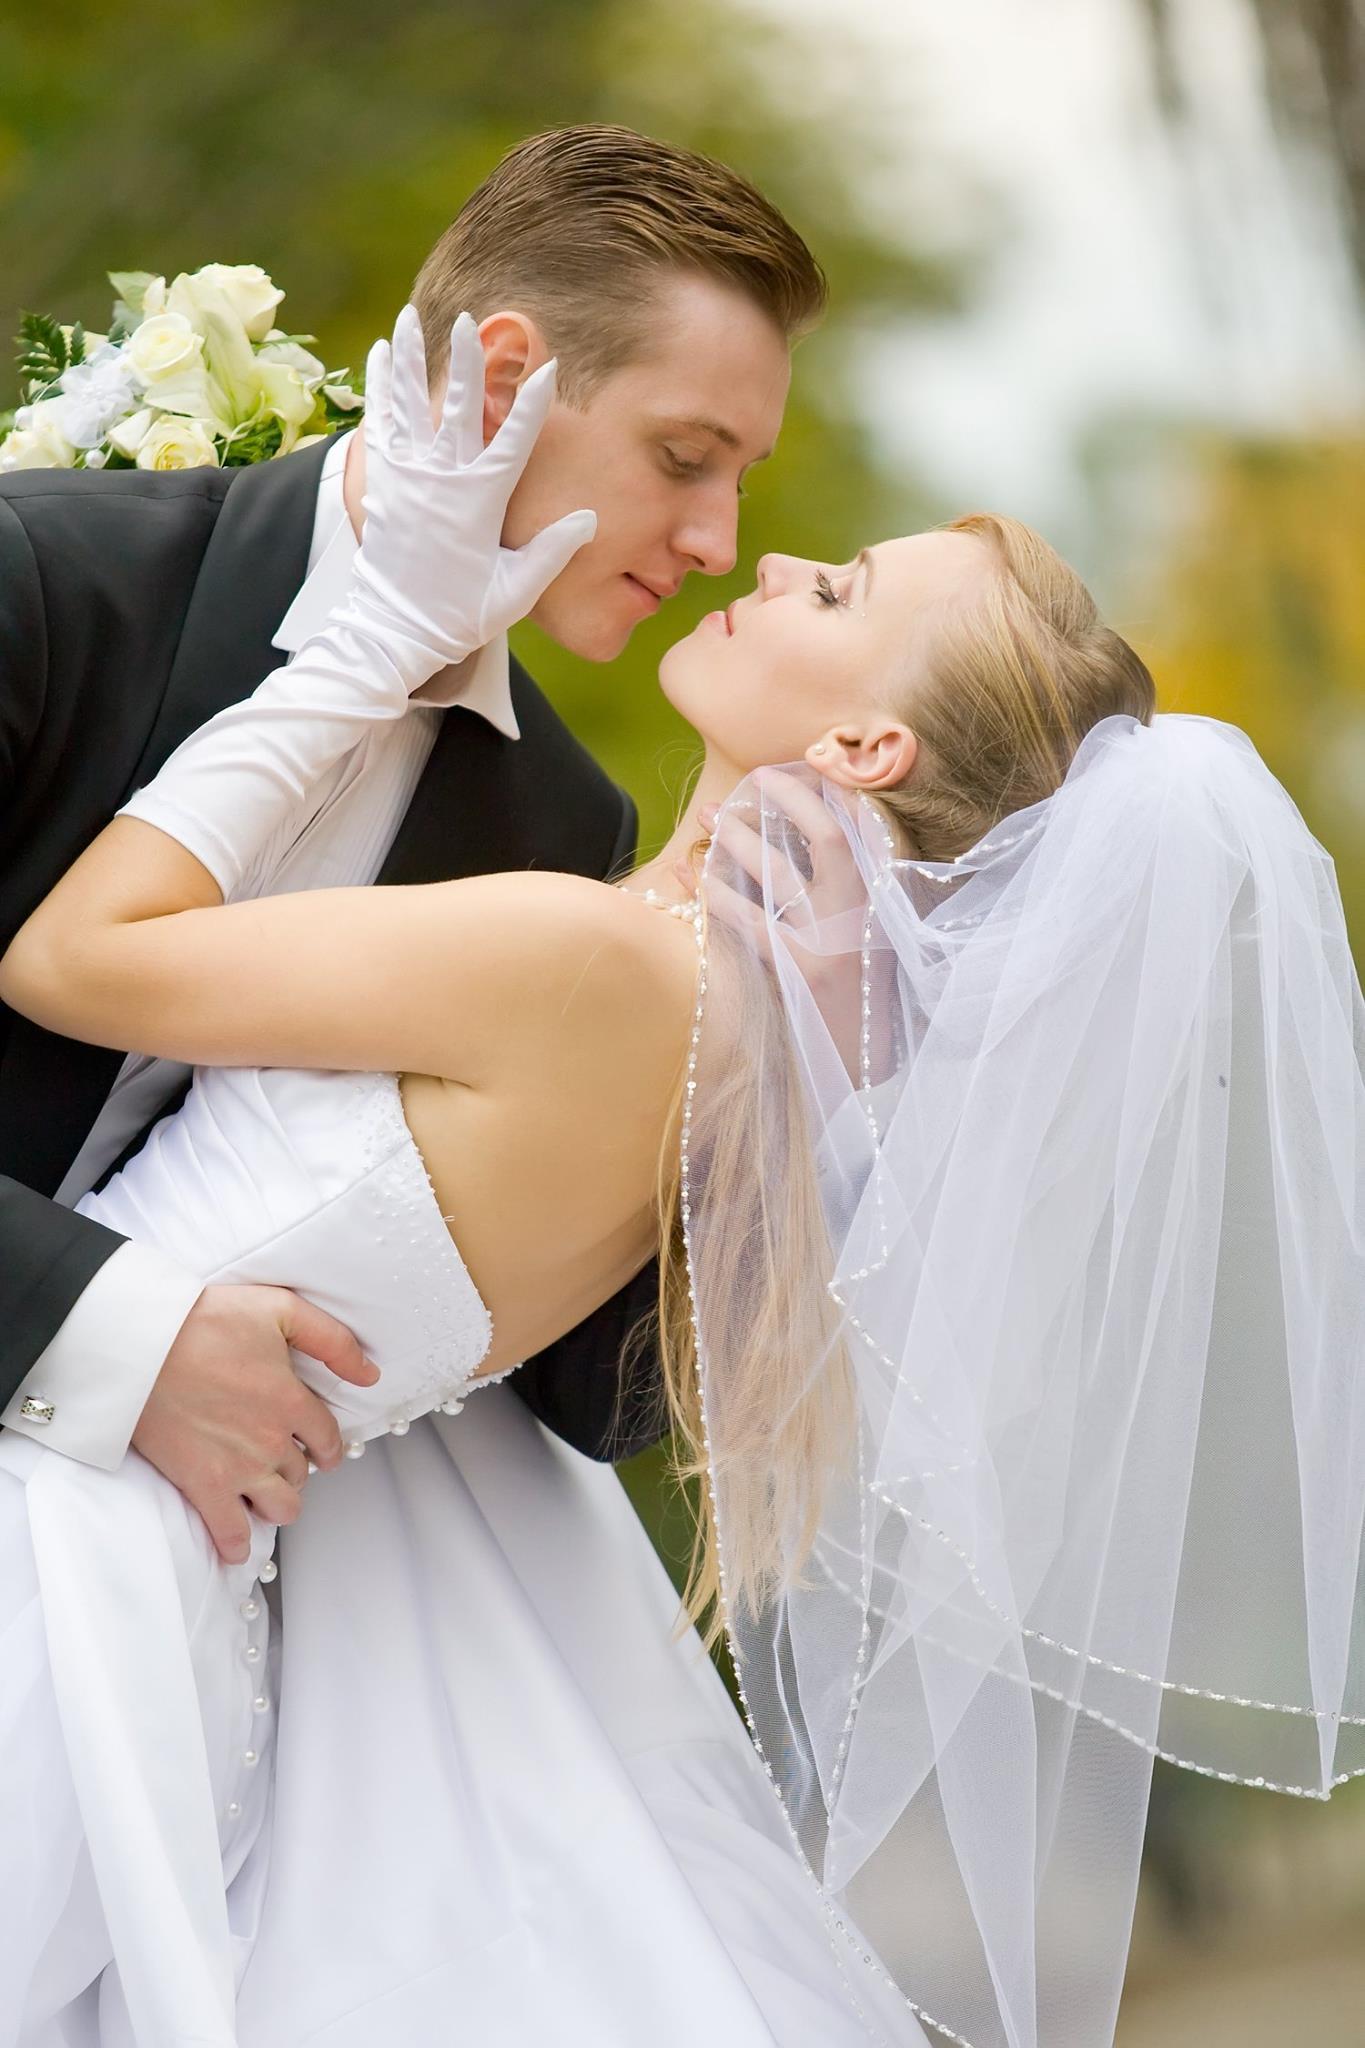 صور عريس وعروسه يوم الزفاف 16 صور عريس وعروسه يوم الزفاف